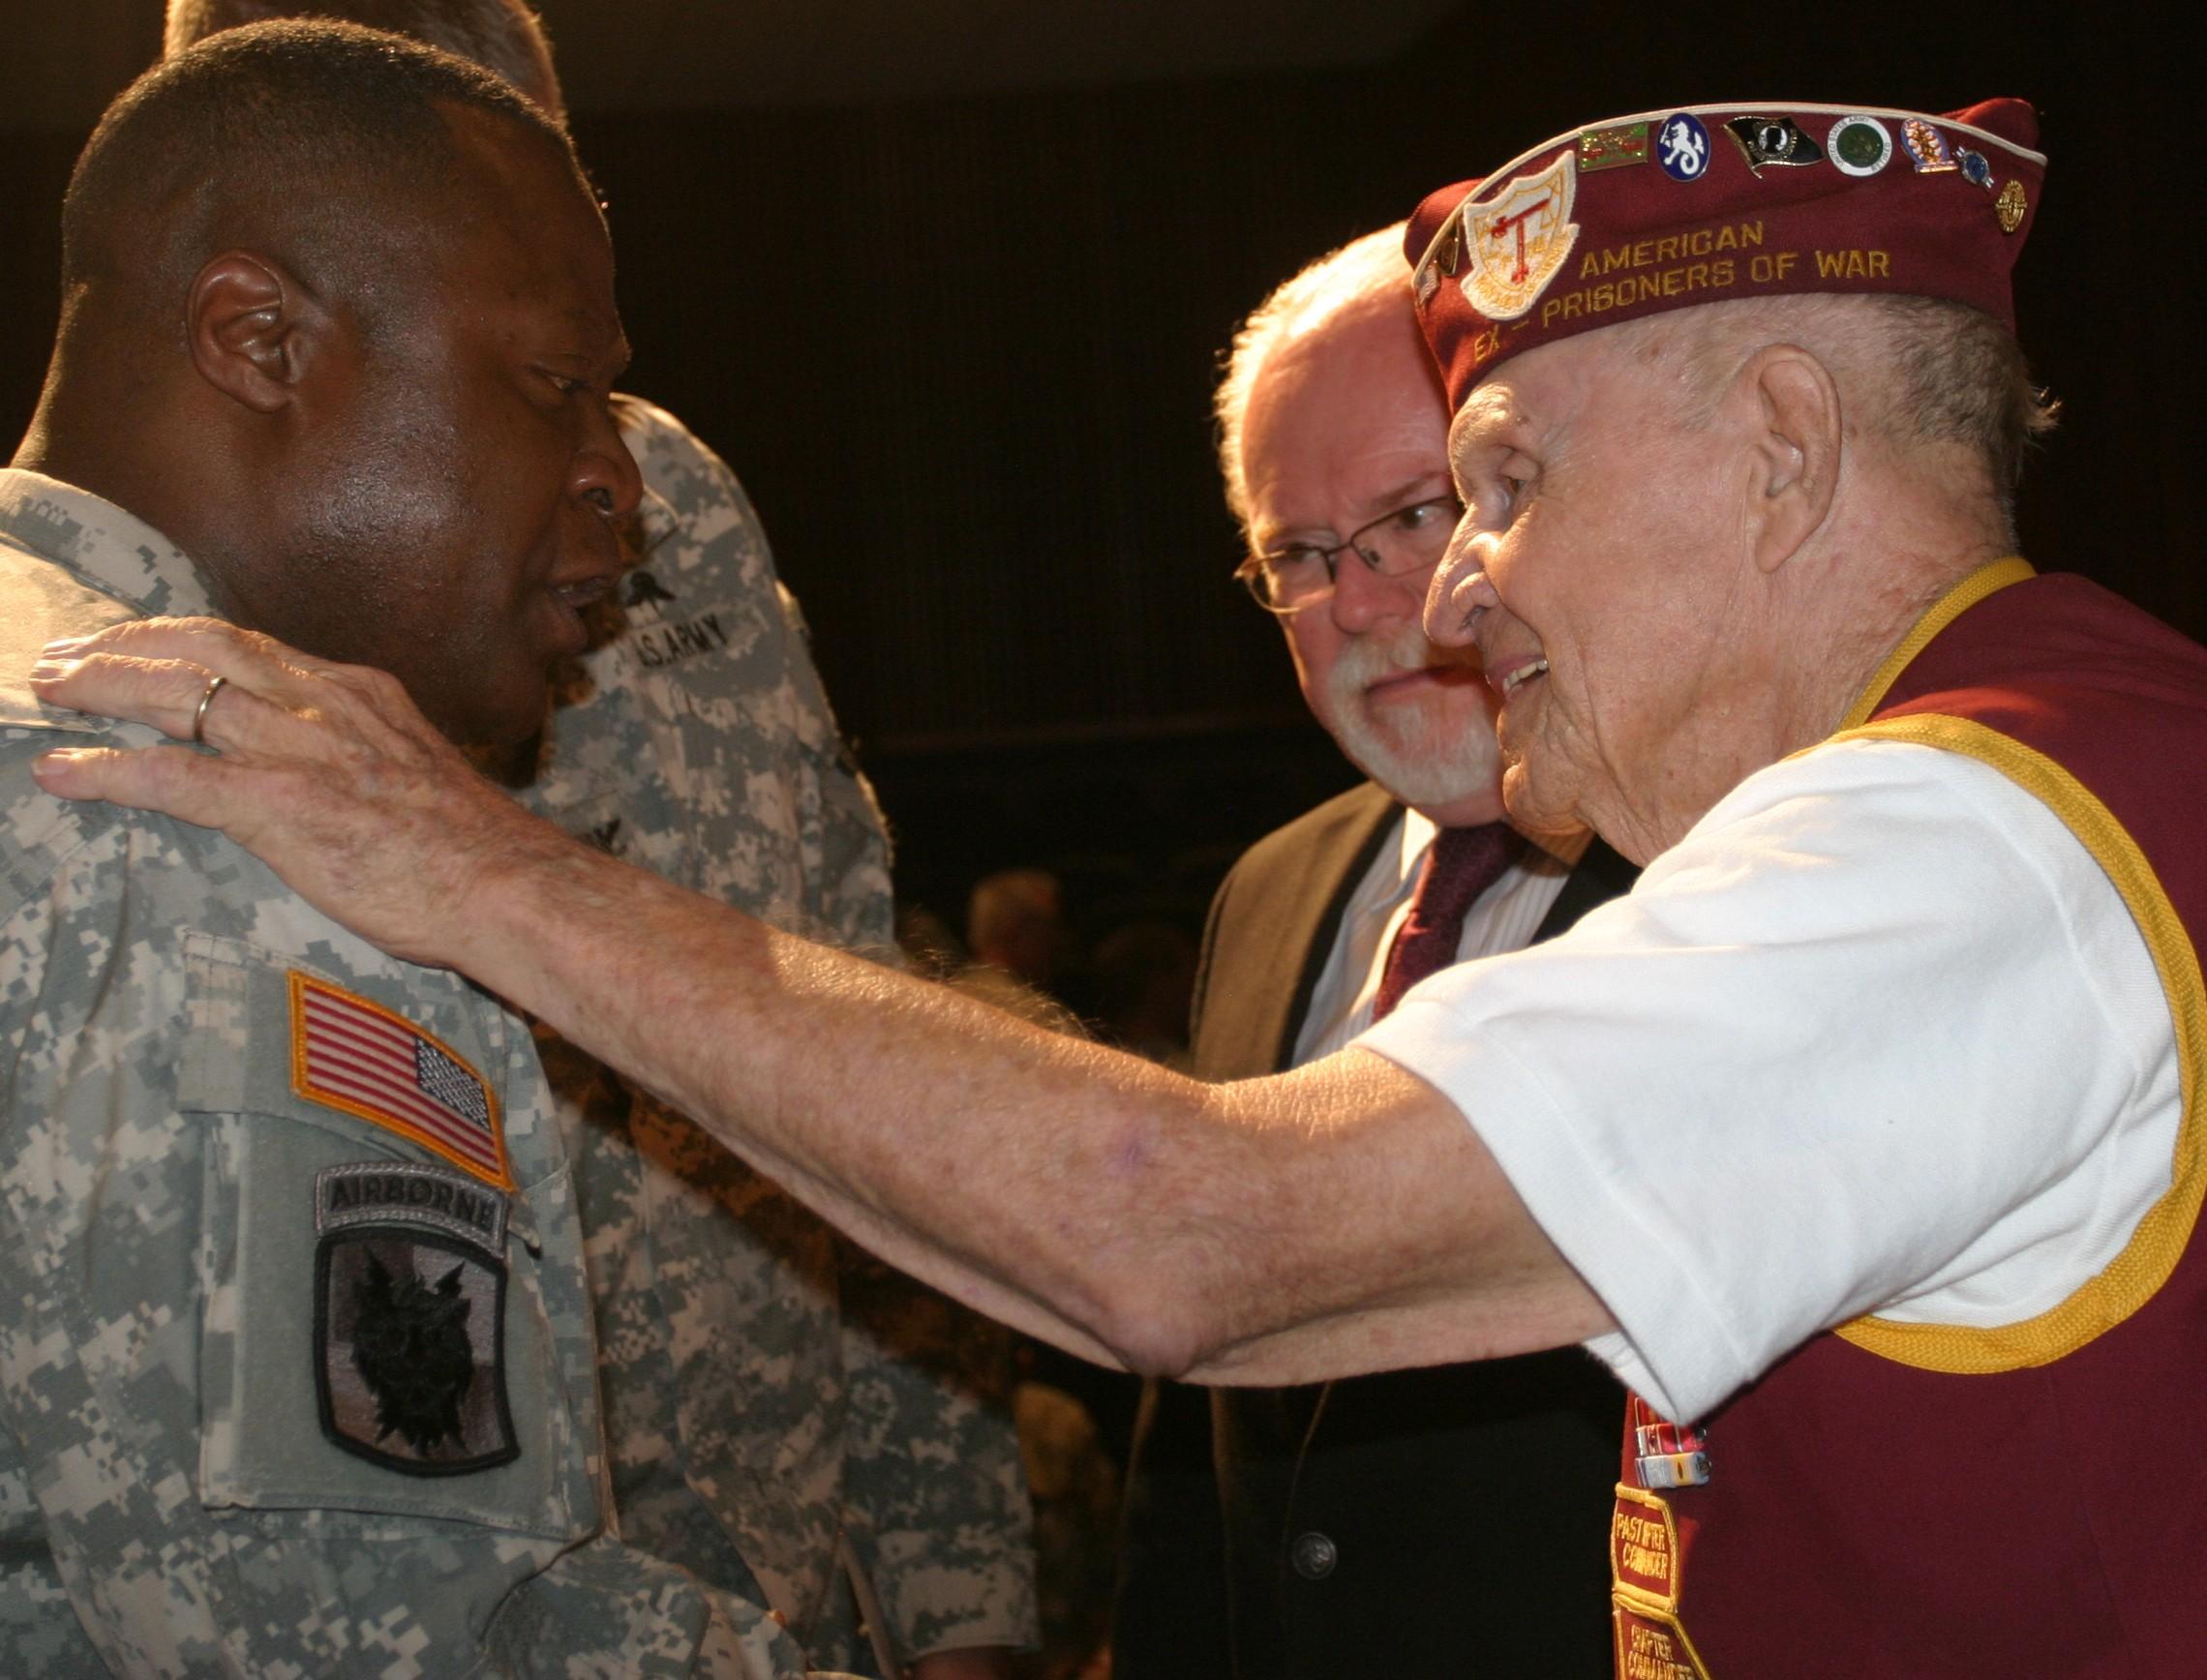 War veteran receives Bronze Star for service   Article   The